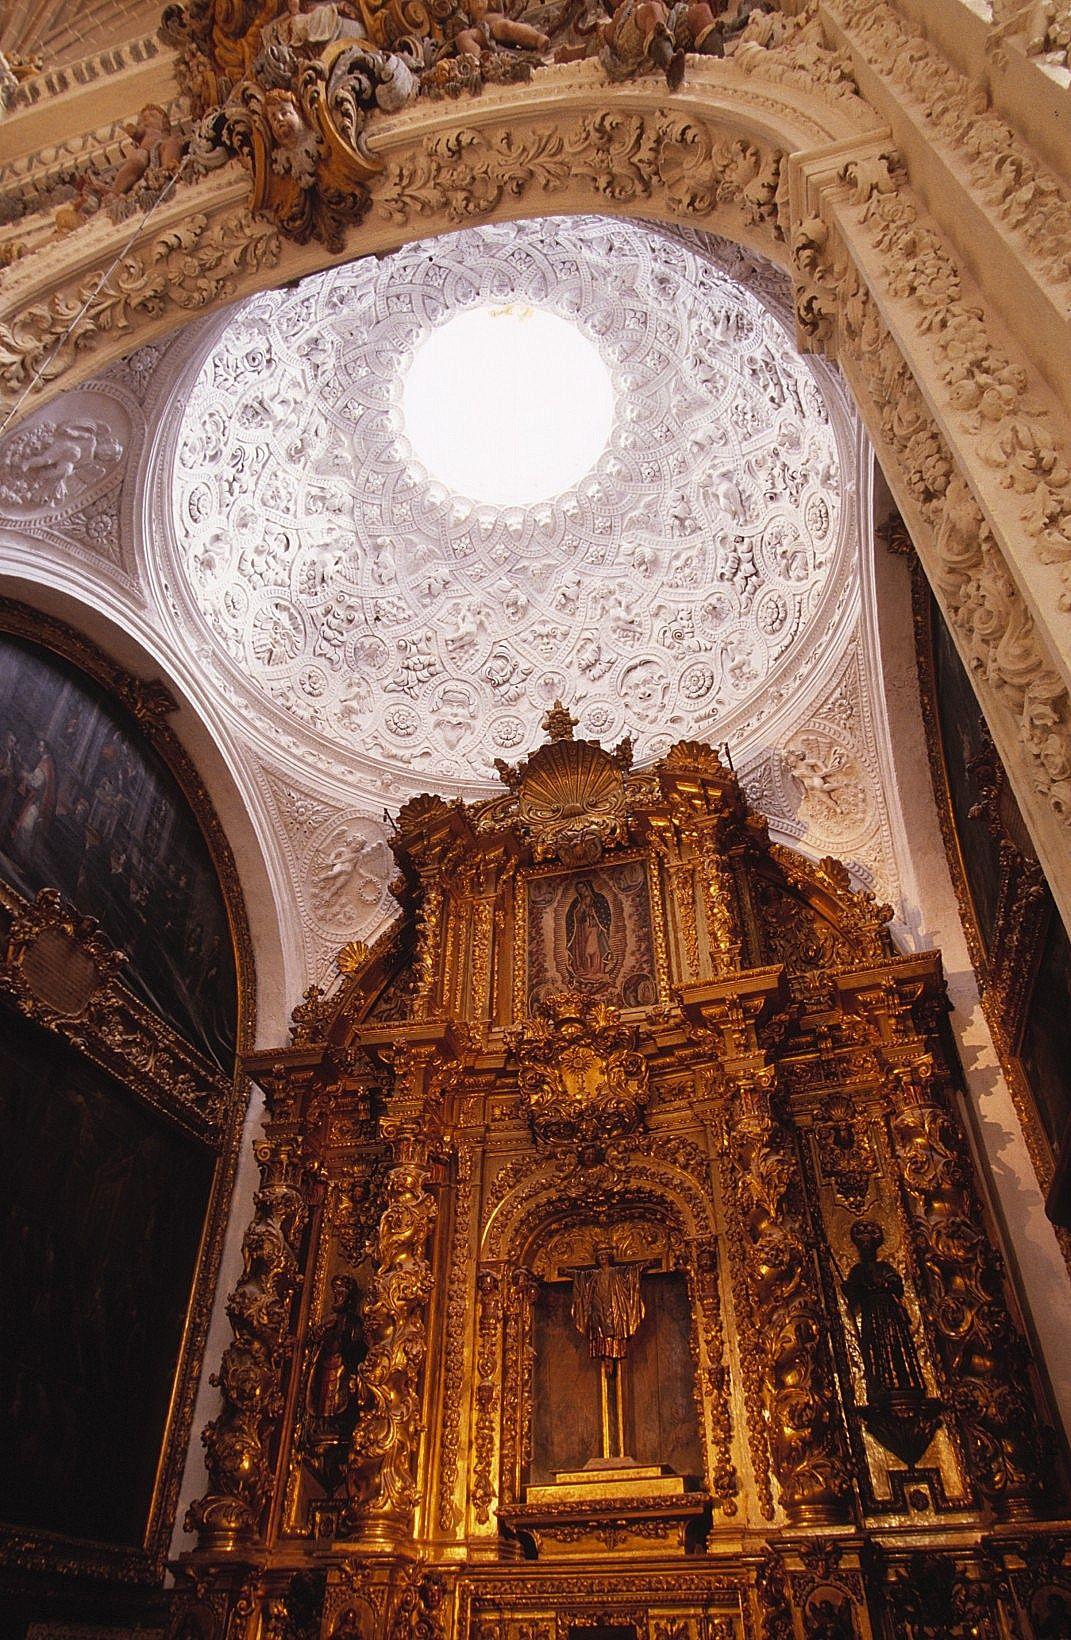 Discovering light - Contemplation - Catedral de la Seo